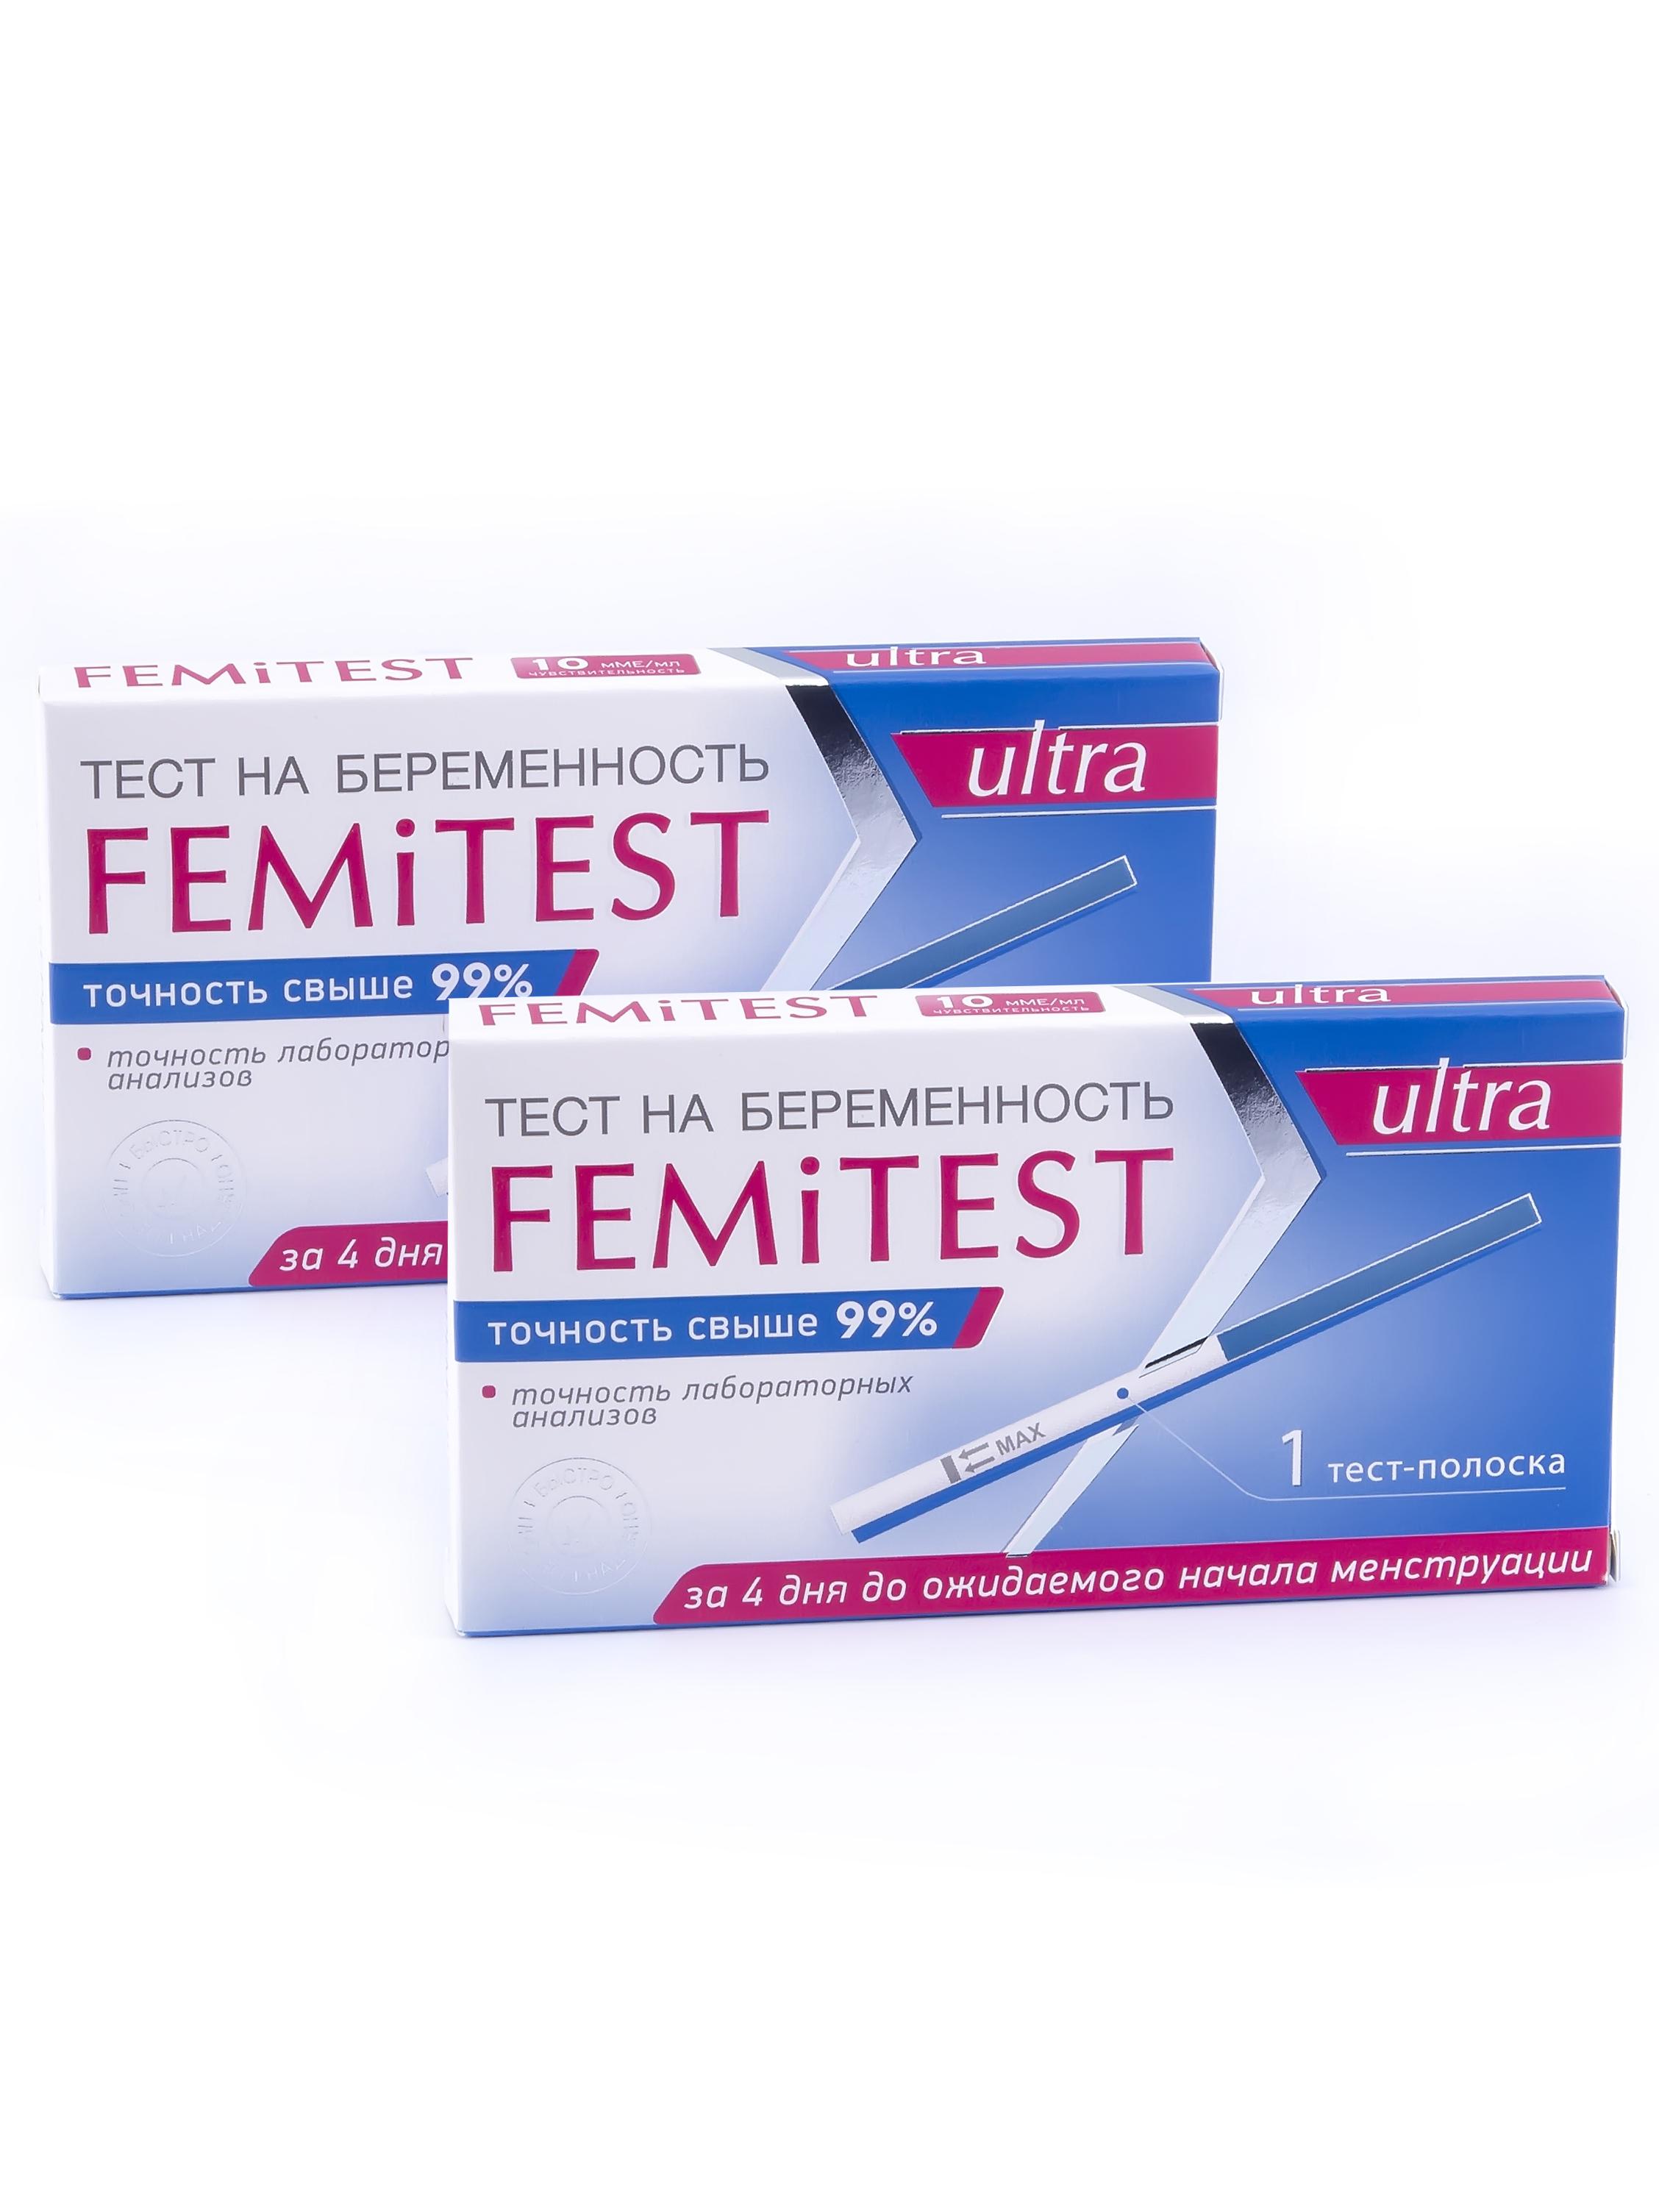 Тест для определения беременности FEMiTEST Ultra тест